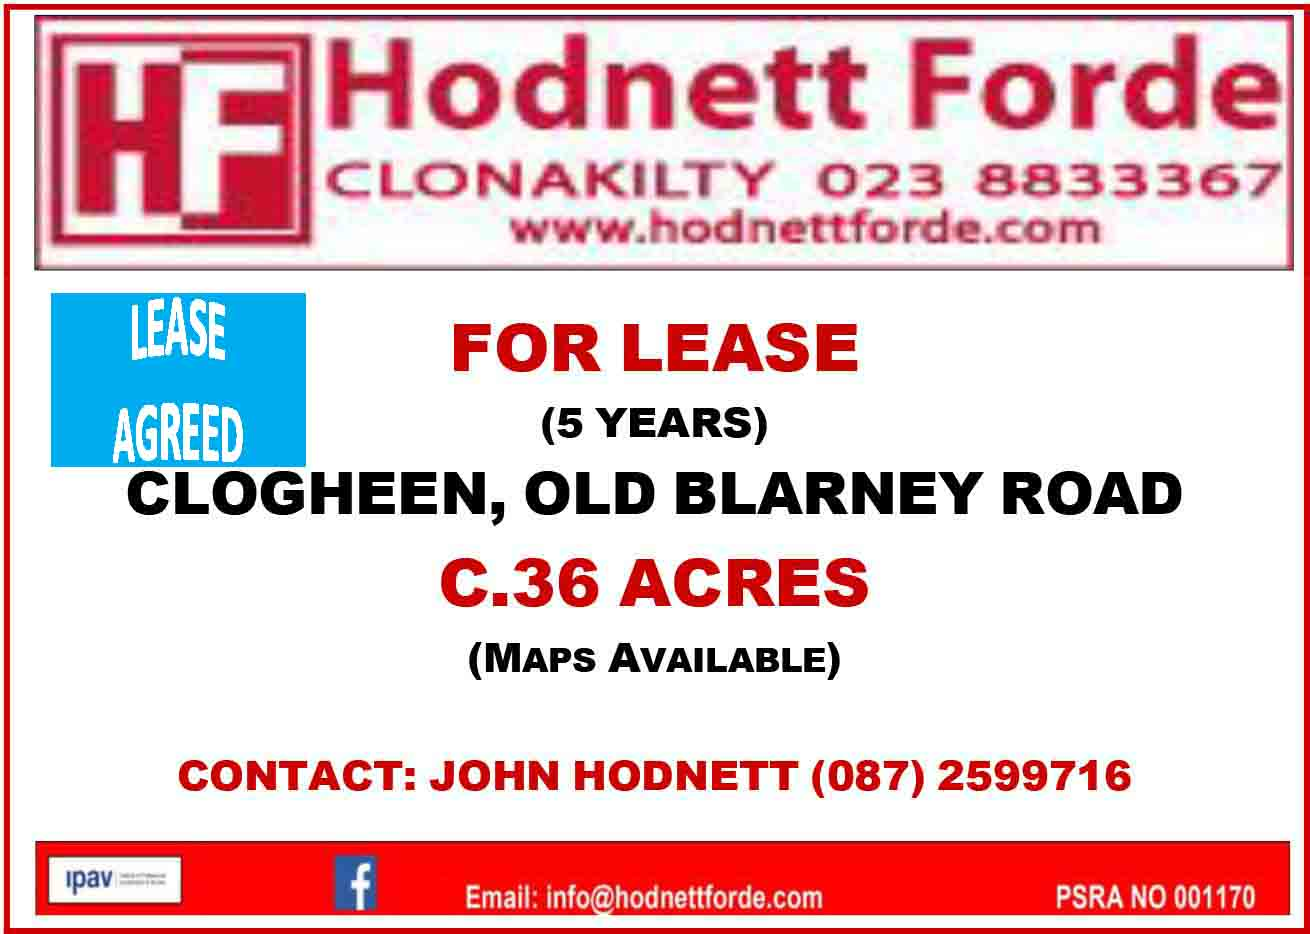 6. Clogheen, Old Blarney Road